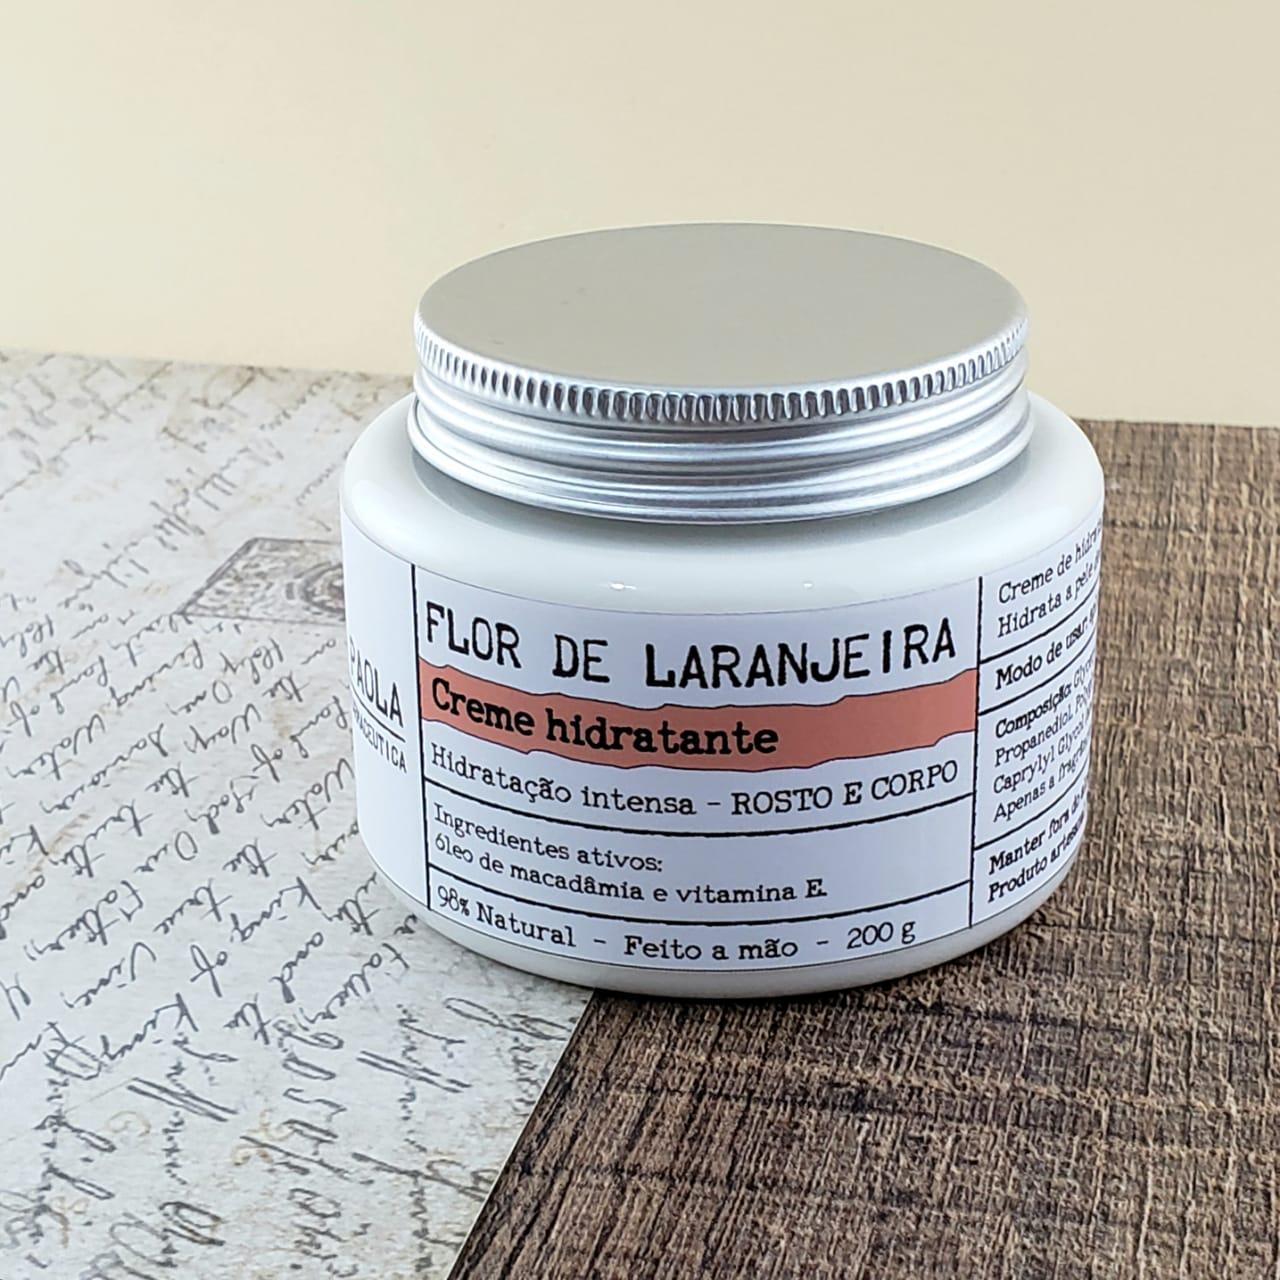 creme-hidratante-flor-de-laranjeira